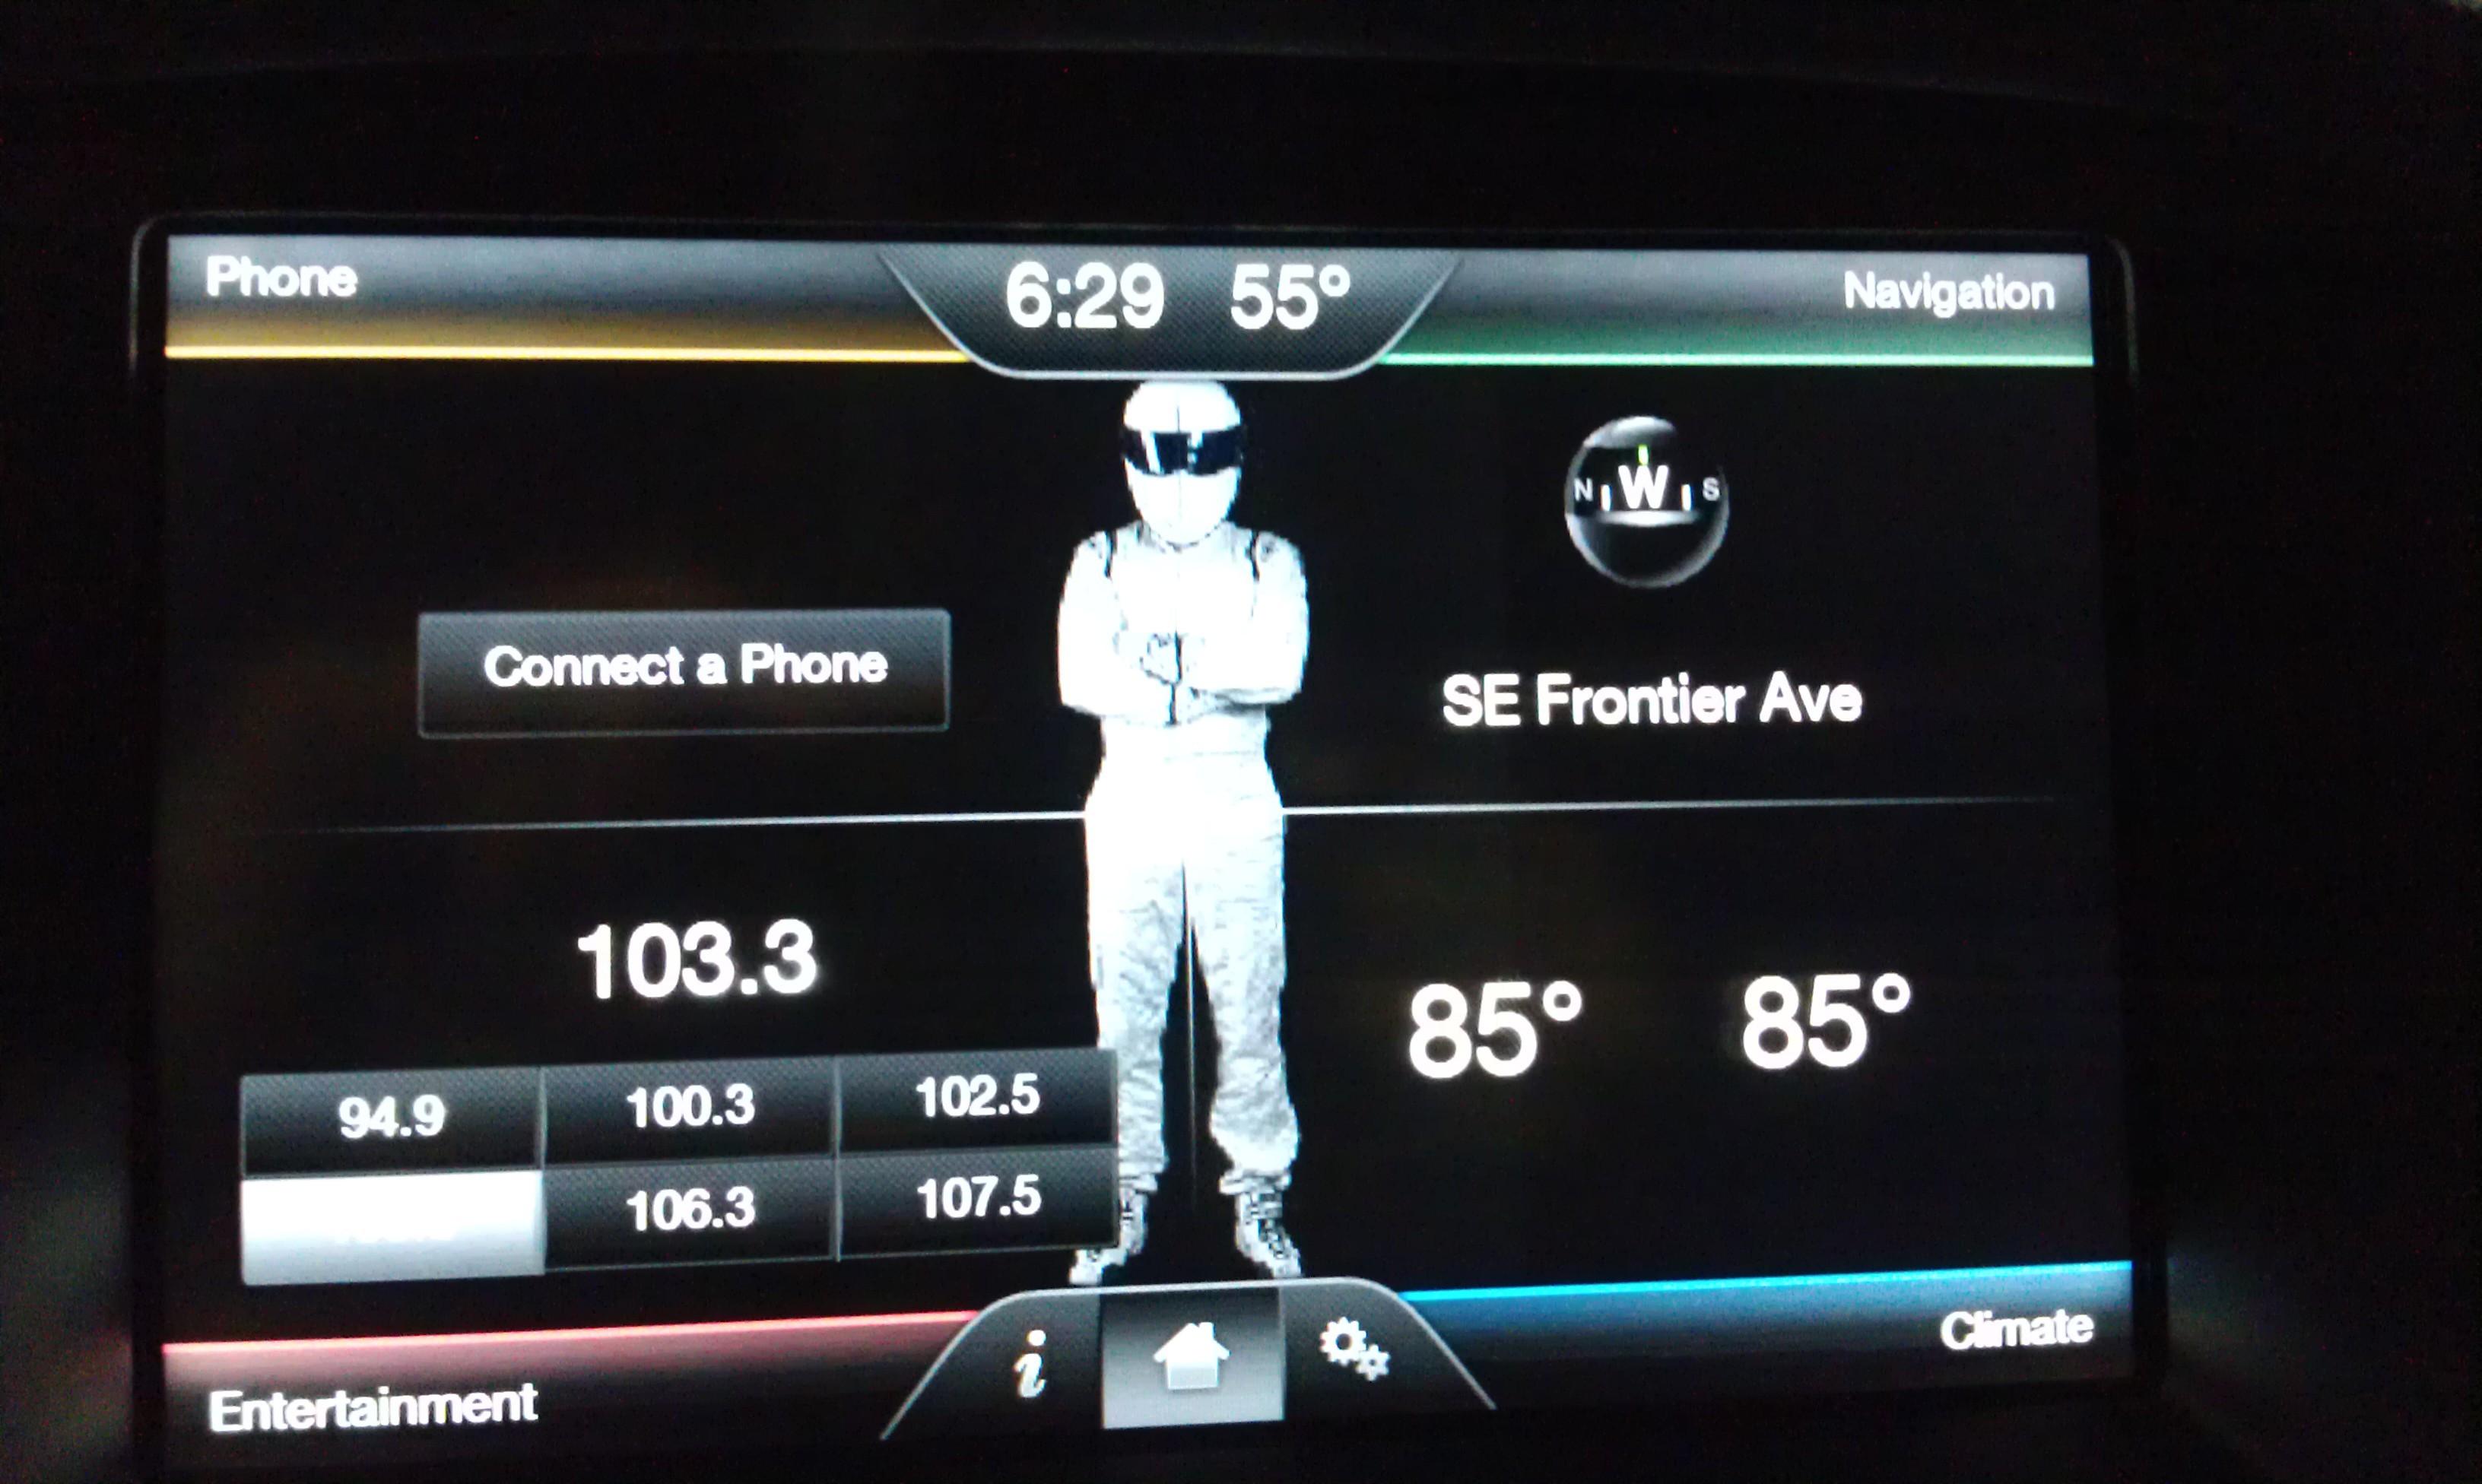 Re: Screensaver on navigation screen